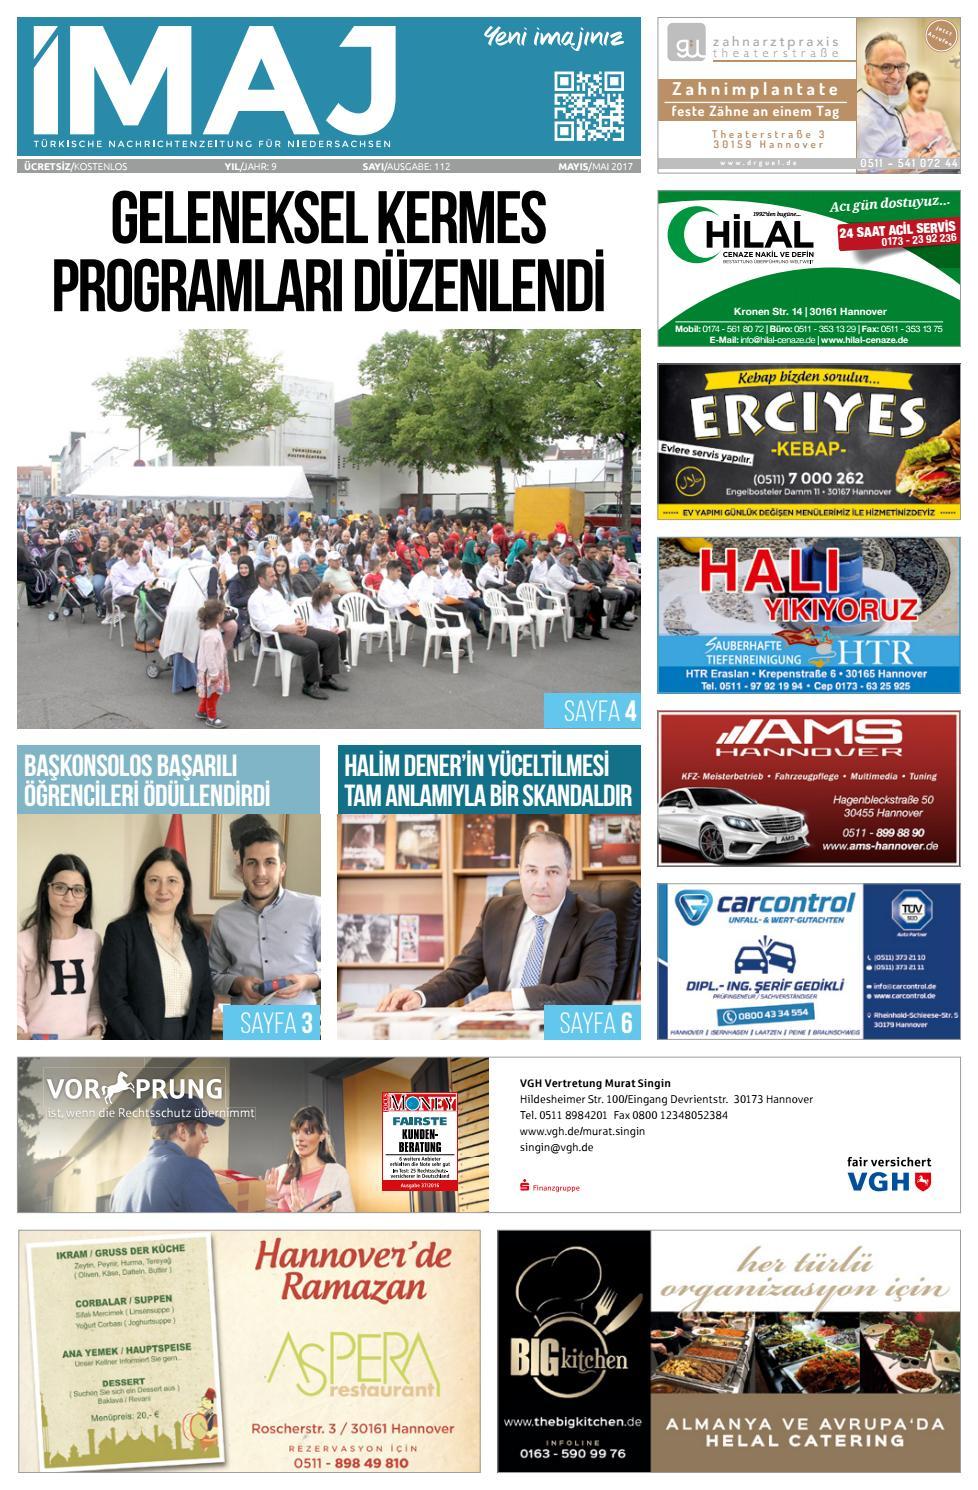 Imaj Gazetesi 112 Sayisi Mayis 2017 By Imajgazetesi Issuu